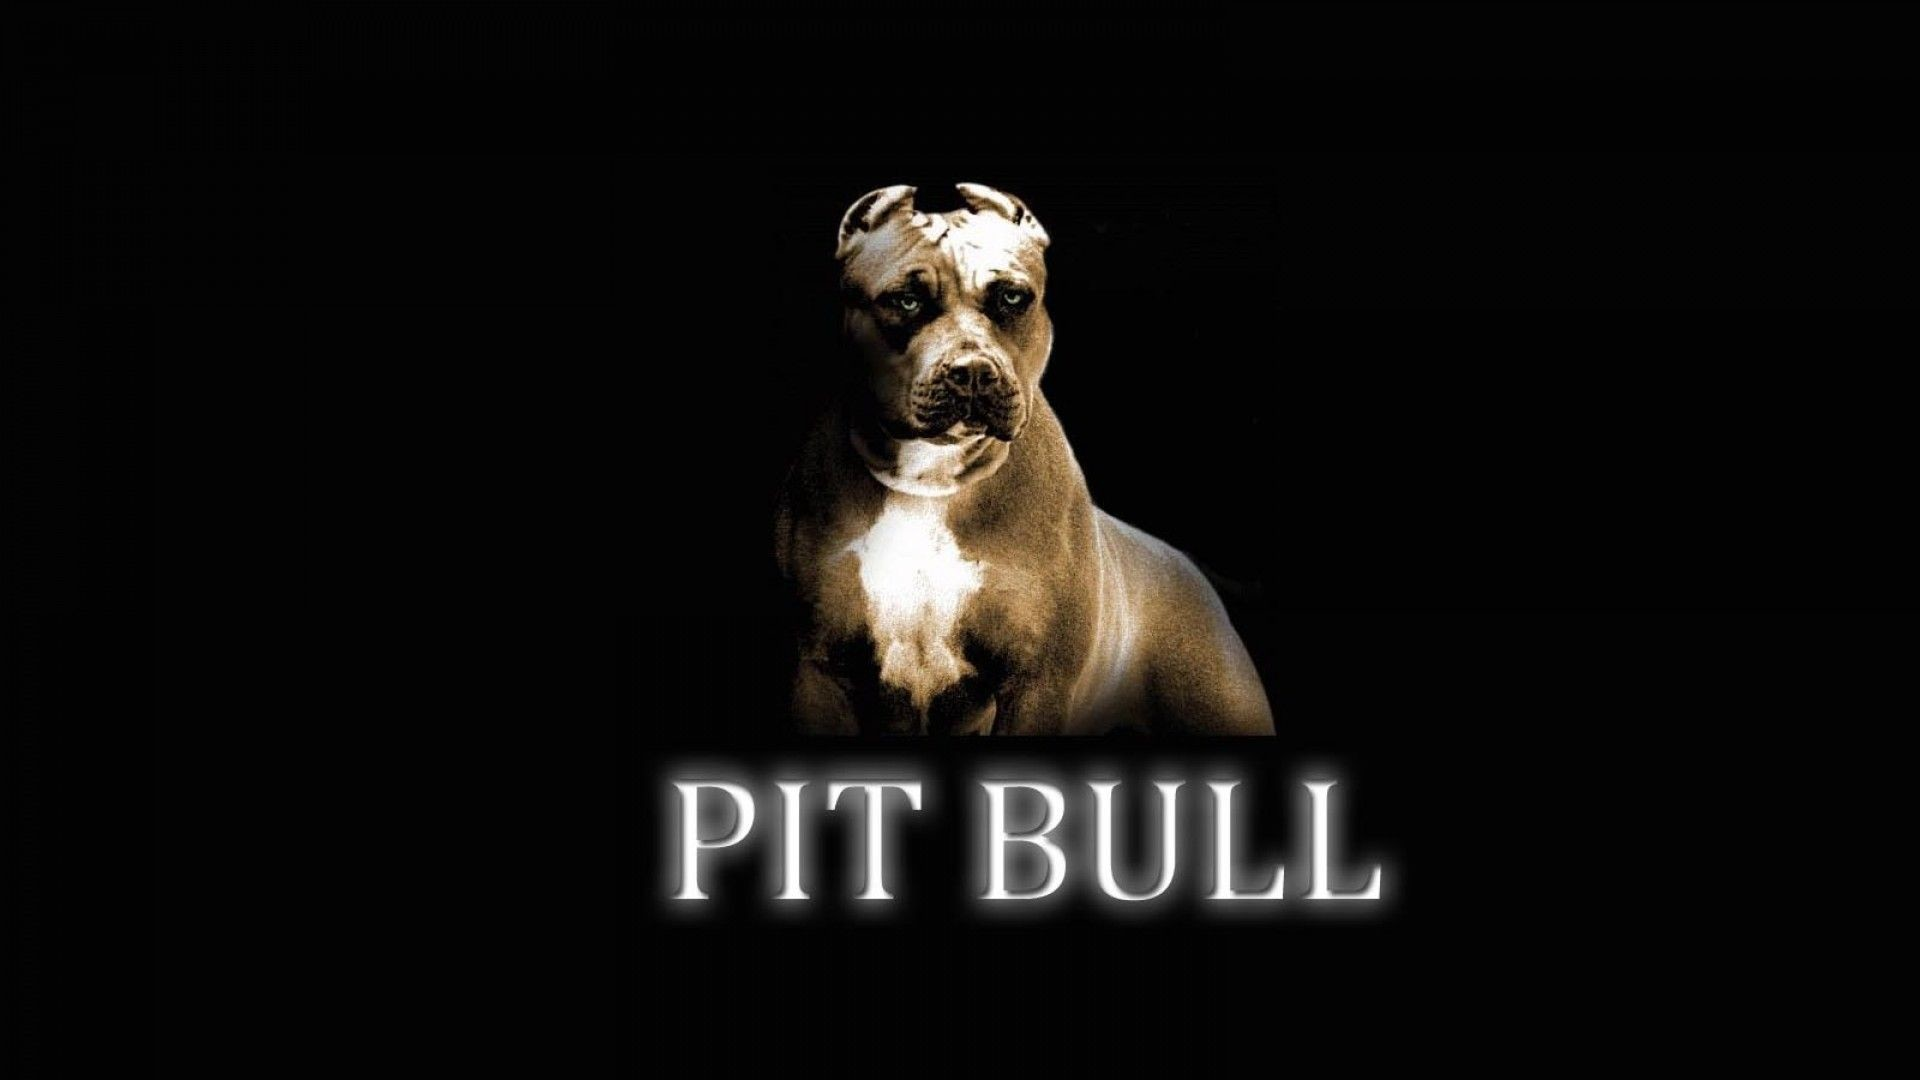 American Pit Bull Terrier Wallpapers HD Download 1920×1080 Pitbull  Wallpapers HD (47 Wallpapers